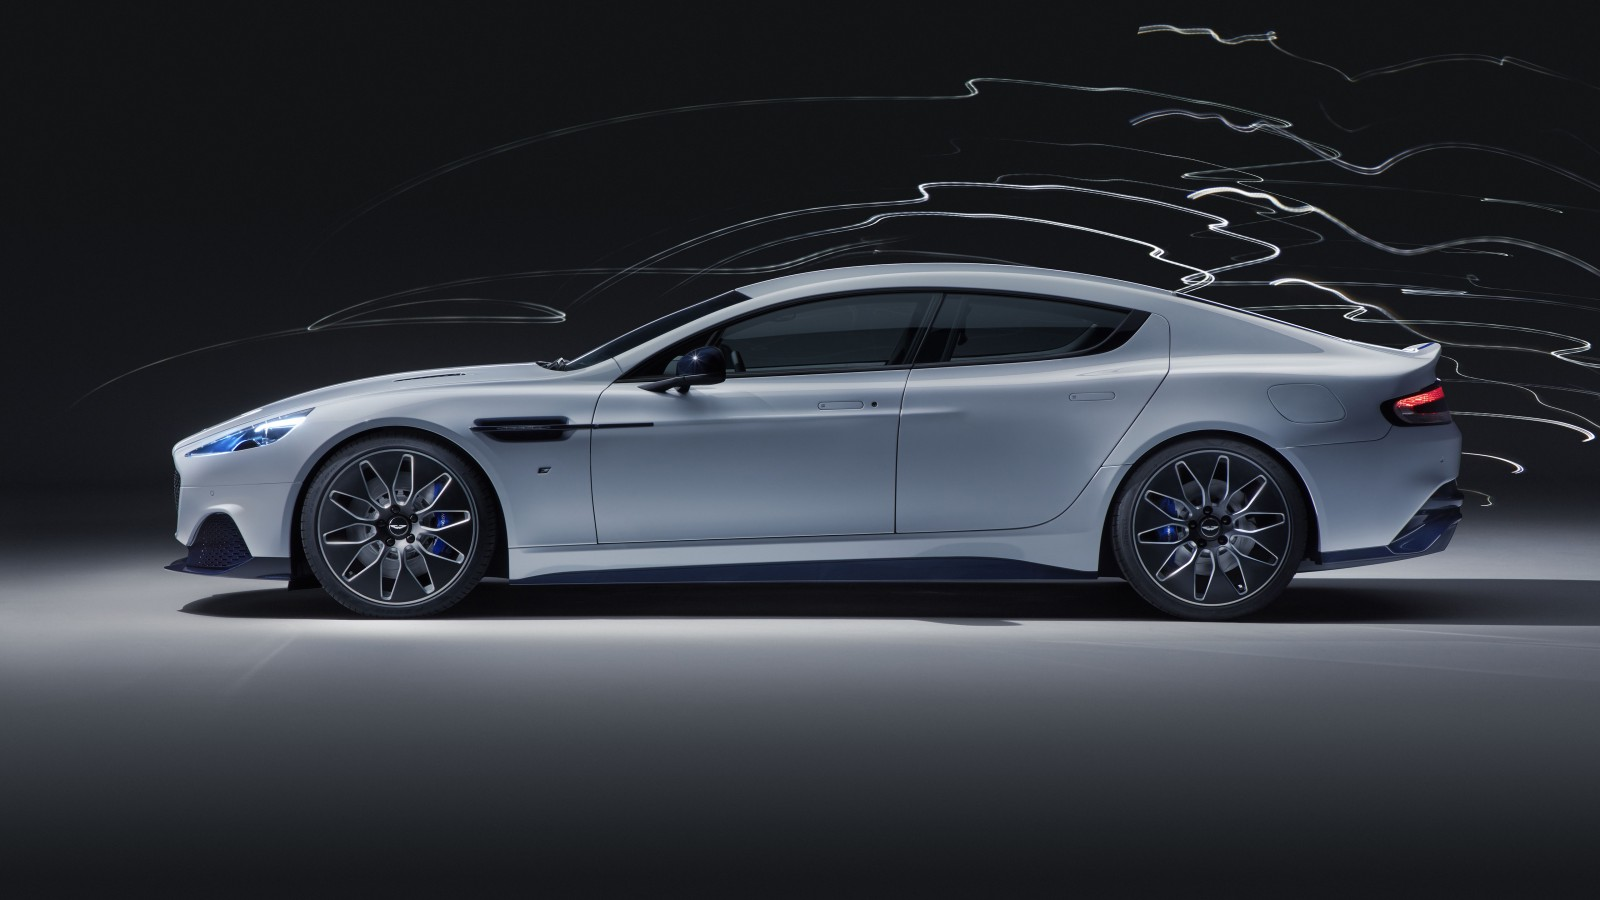 Aston Martin Rapide E 2019 5K 3 Wallpaper   HD Car ...